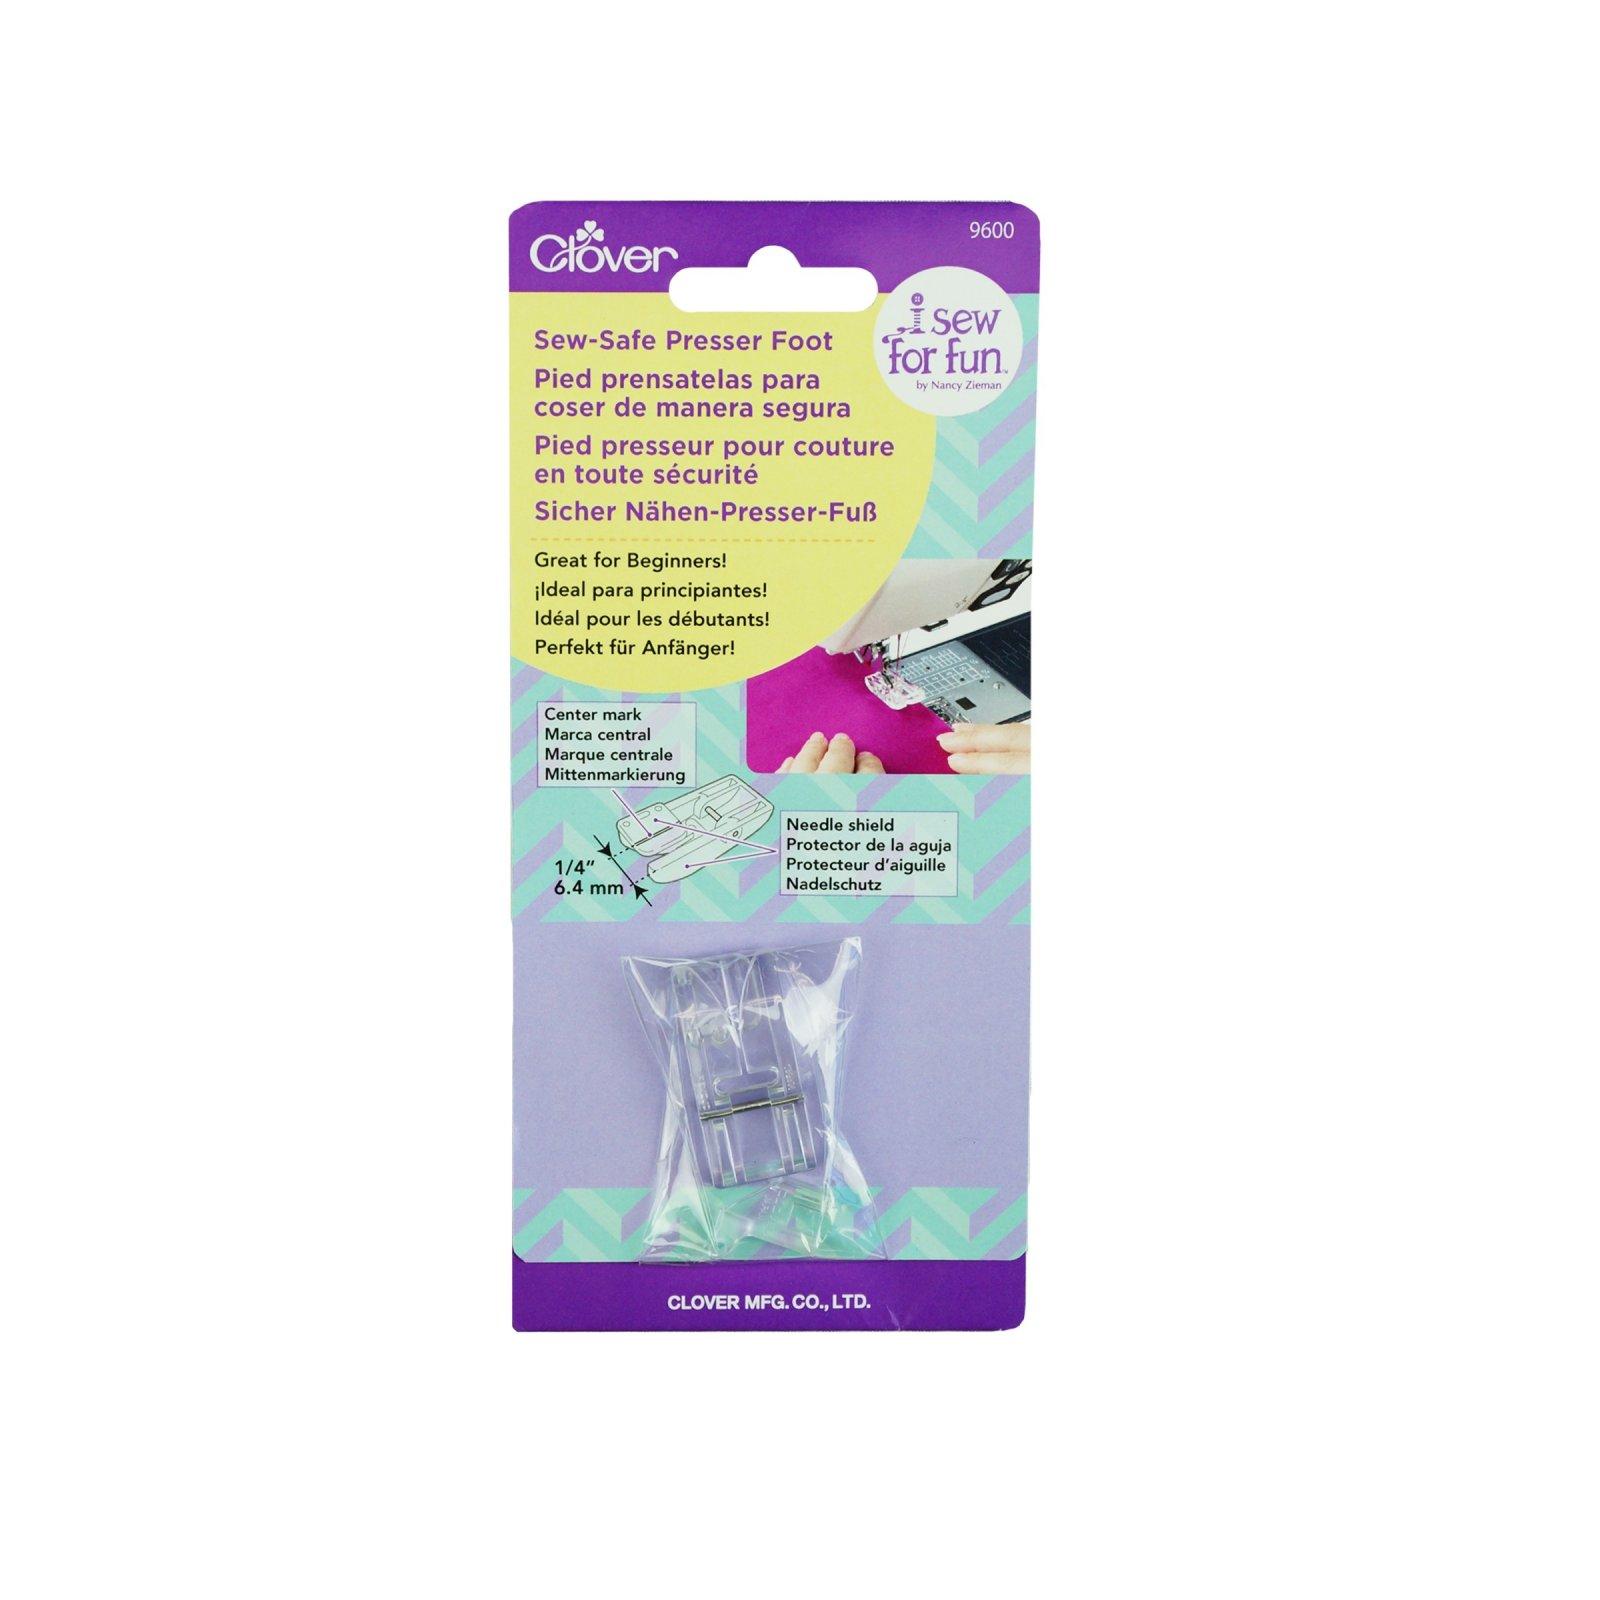 Clover I Sew For Fun - Sew Safe Presser Foot CL9600